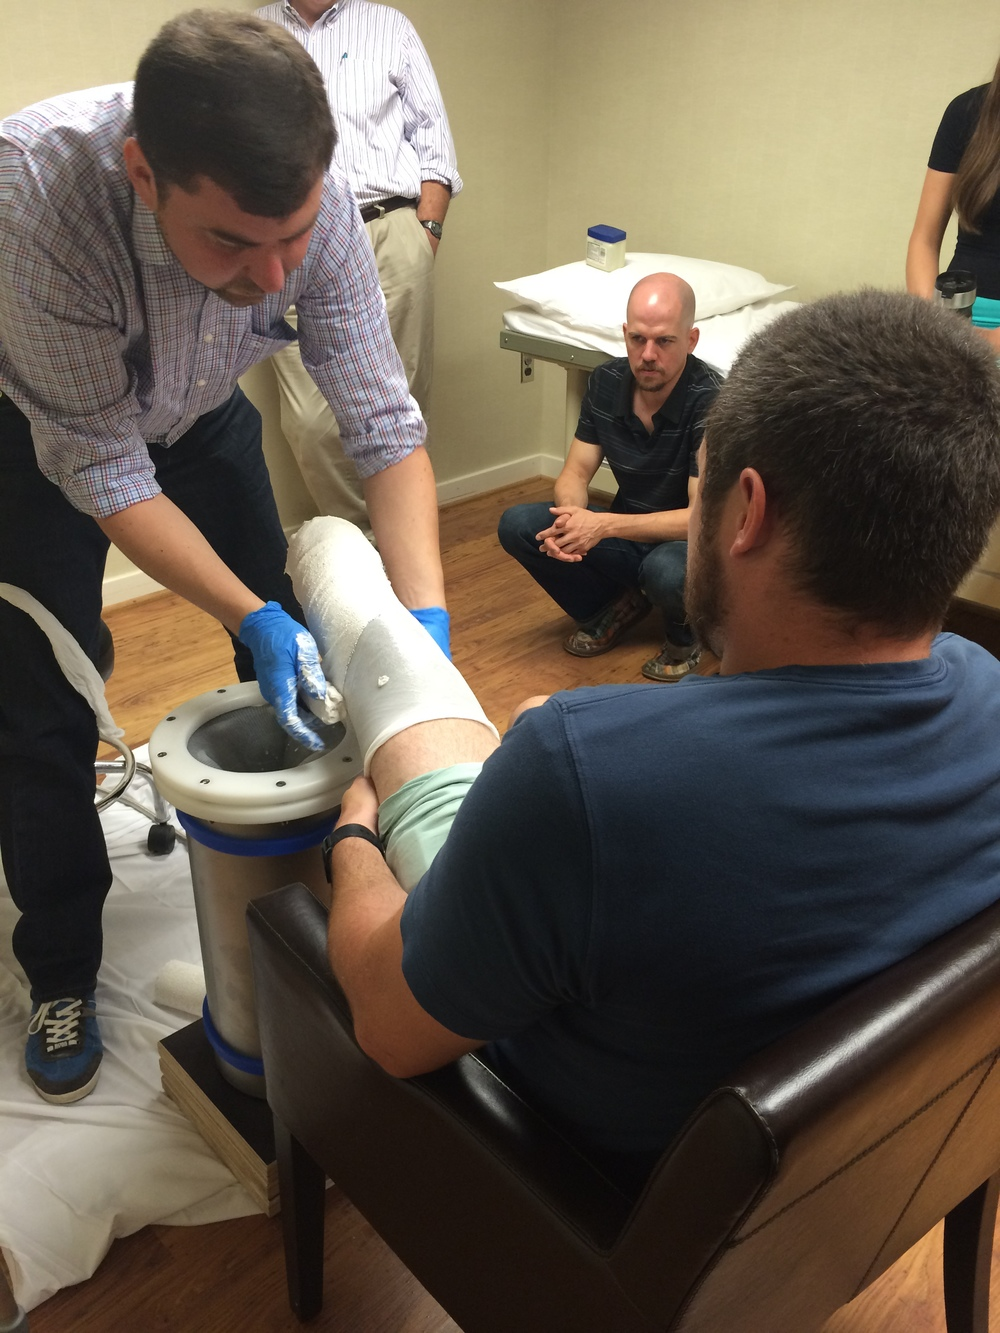 Casting the leg